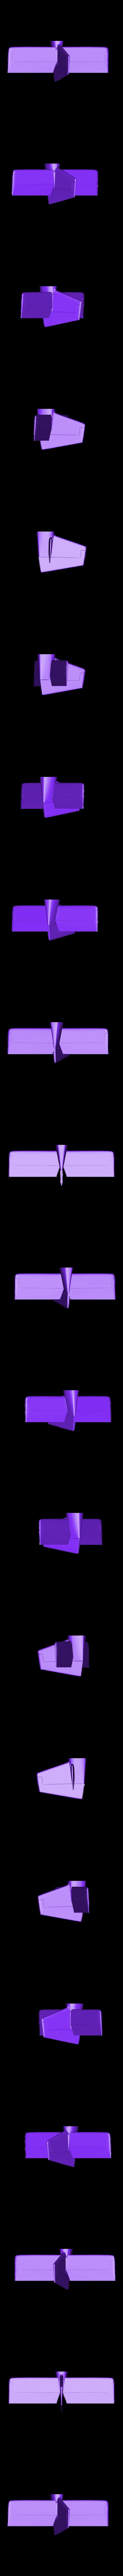 Rudder.STL Download STL file Vans RV-10 • 3D print template, Eduardohbm